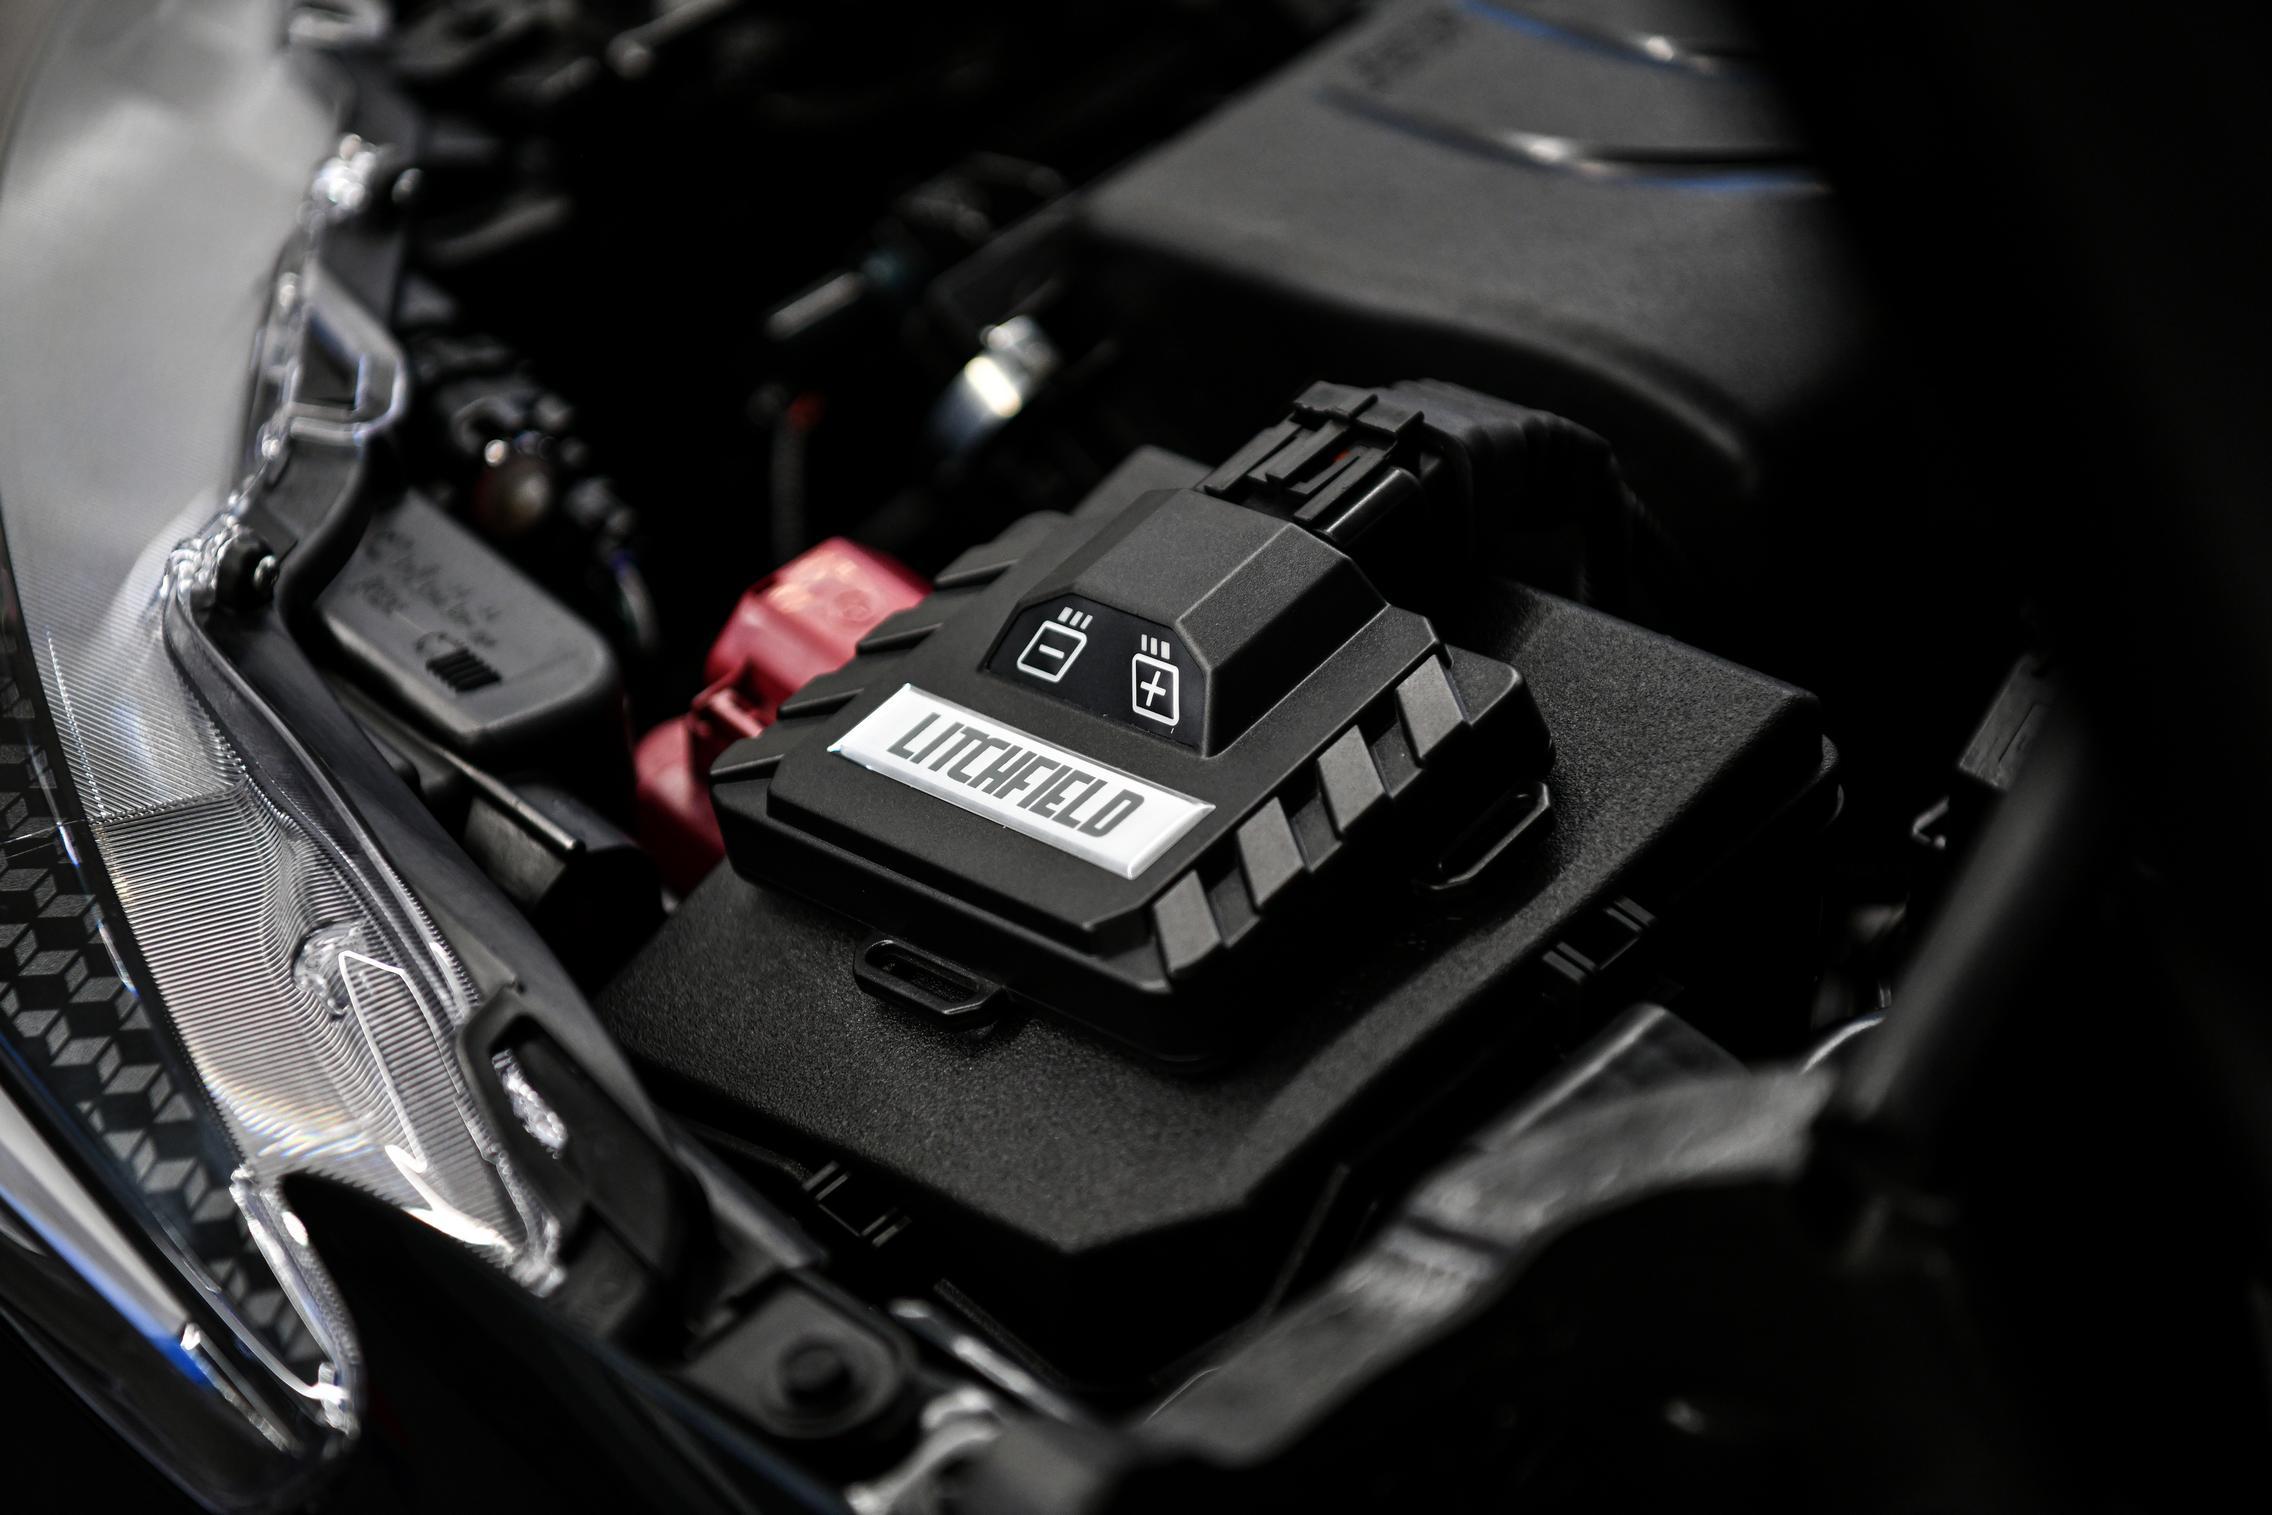 Toyota GR Yaris engine